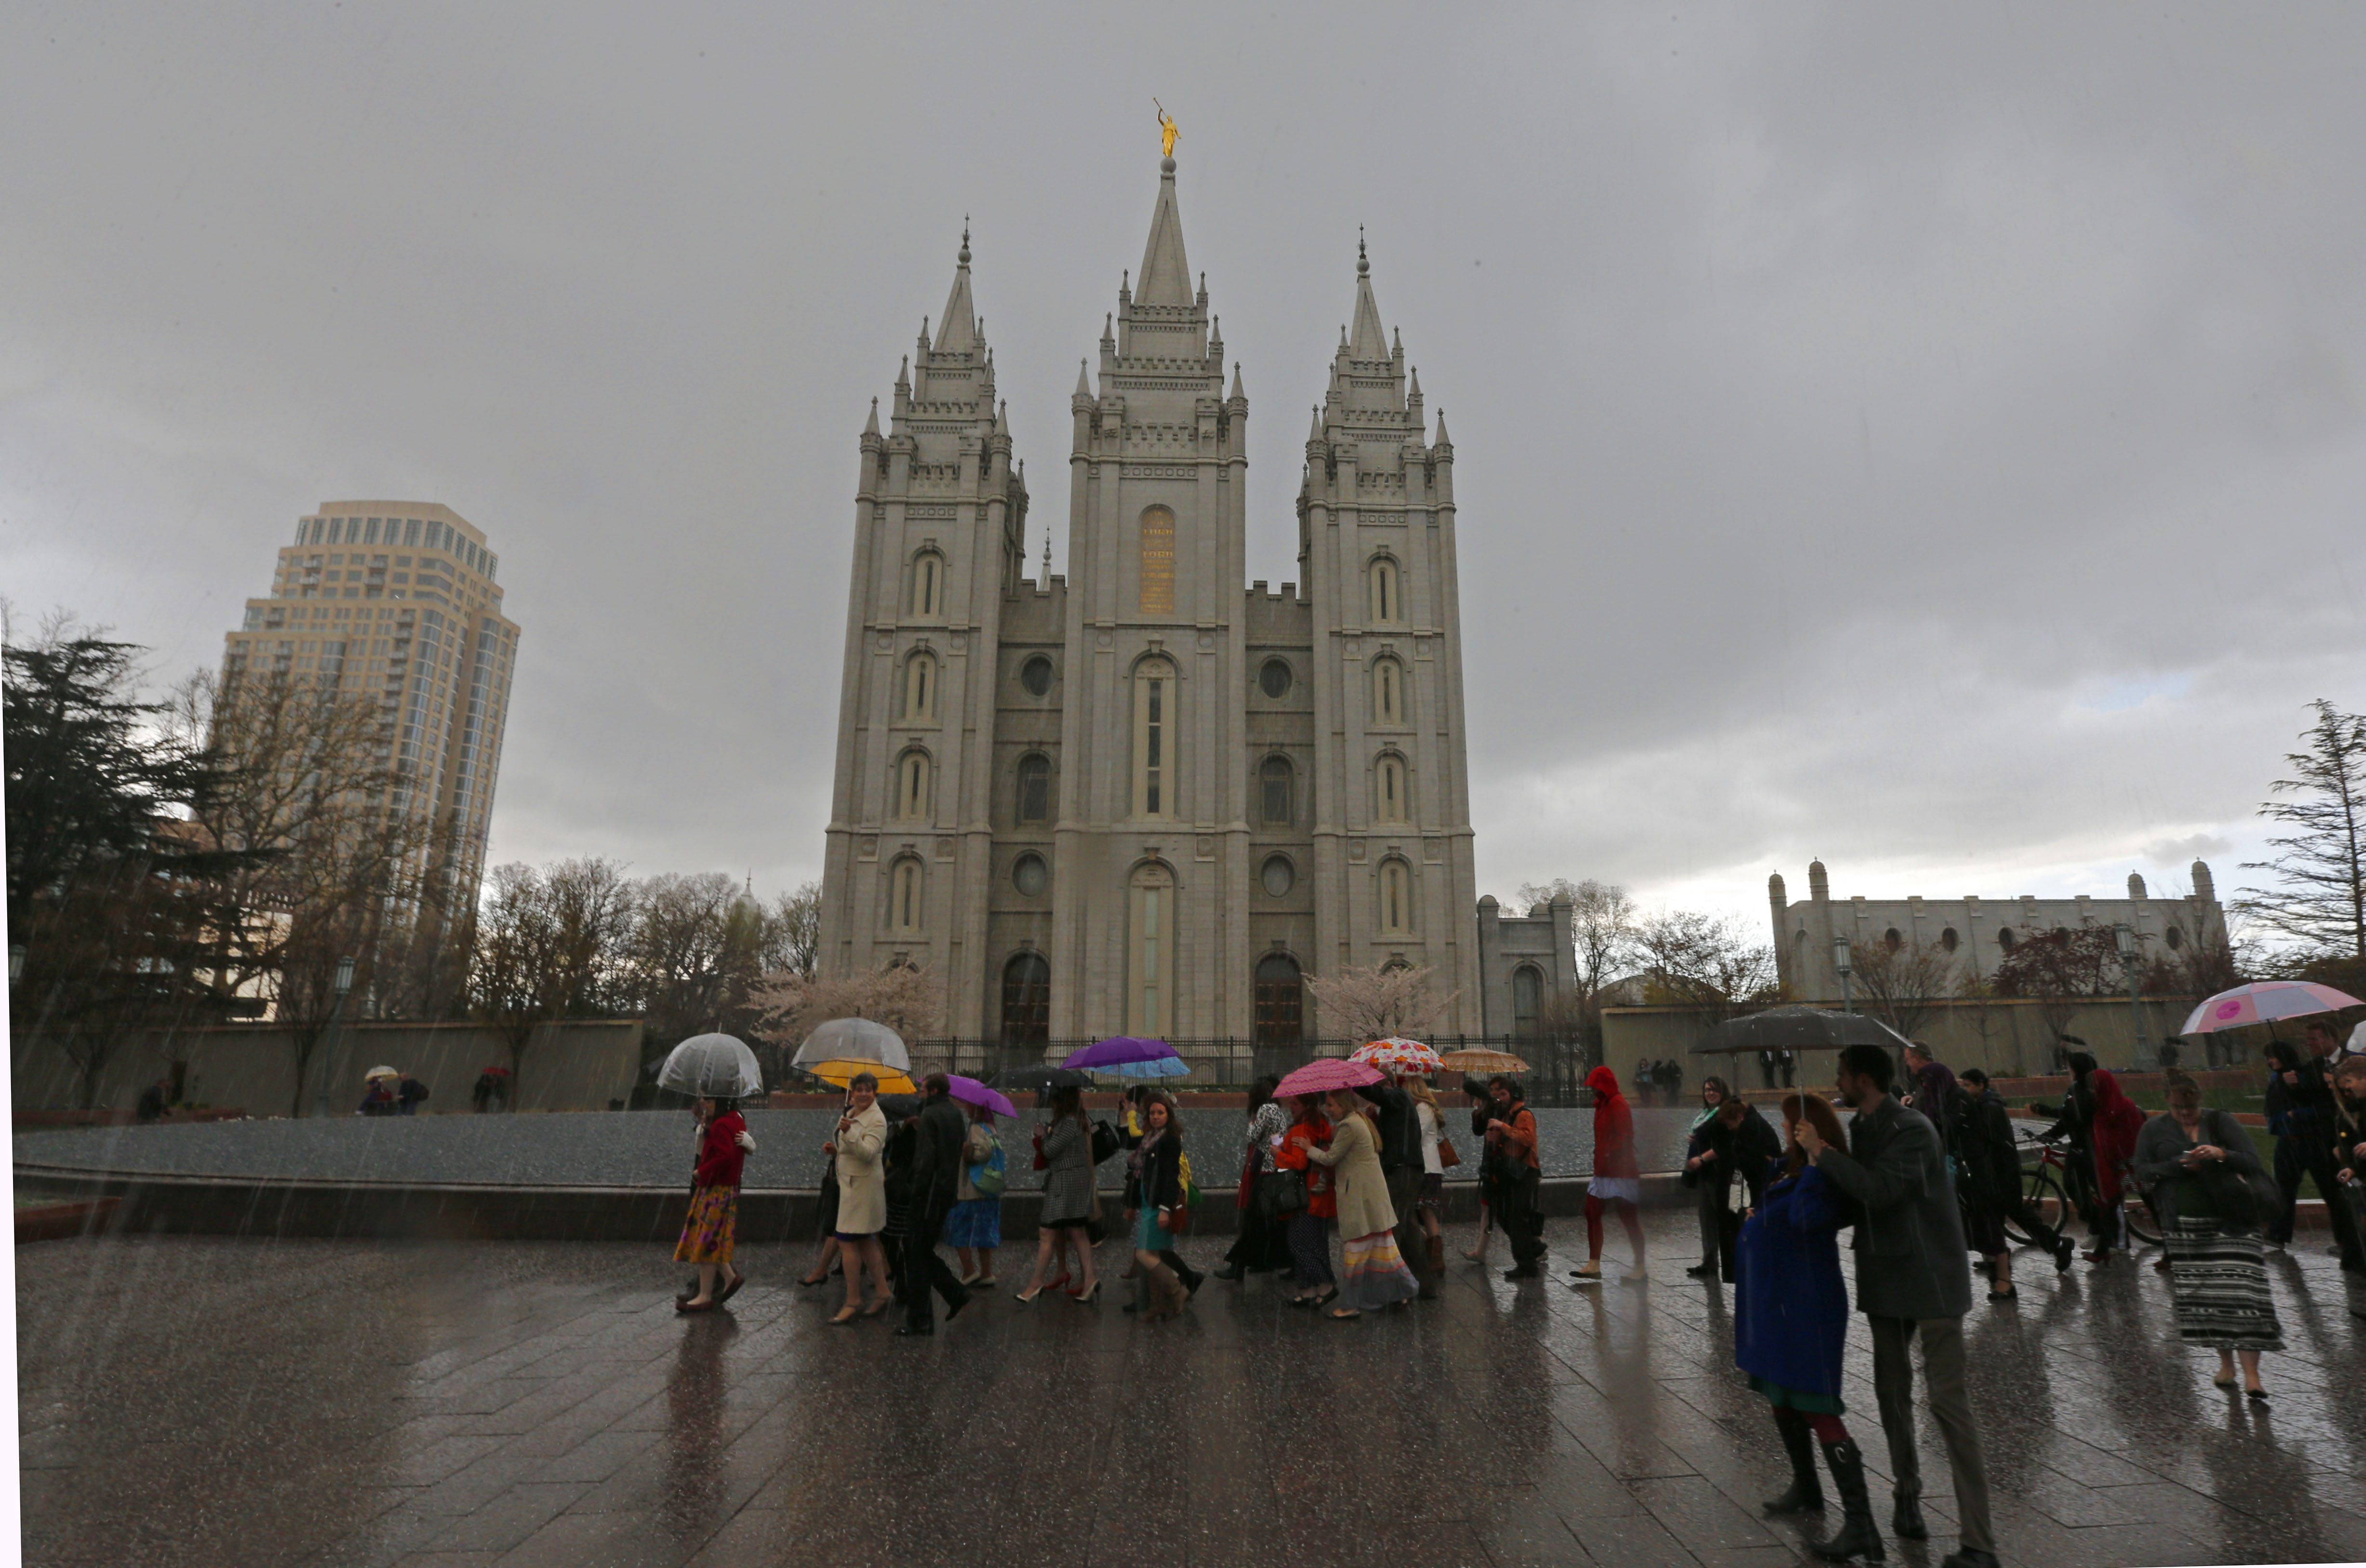 The Salt Lake Temple of the Mormon church on April 5, 2014 in Salt Lake City,